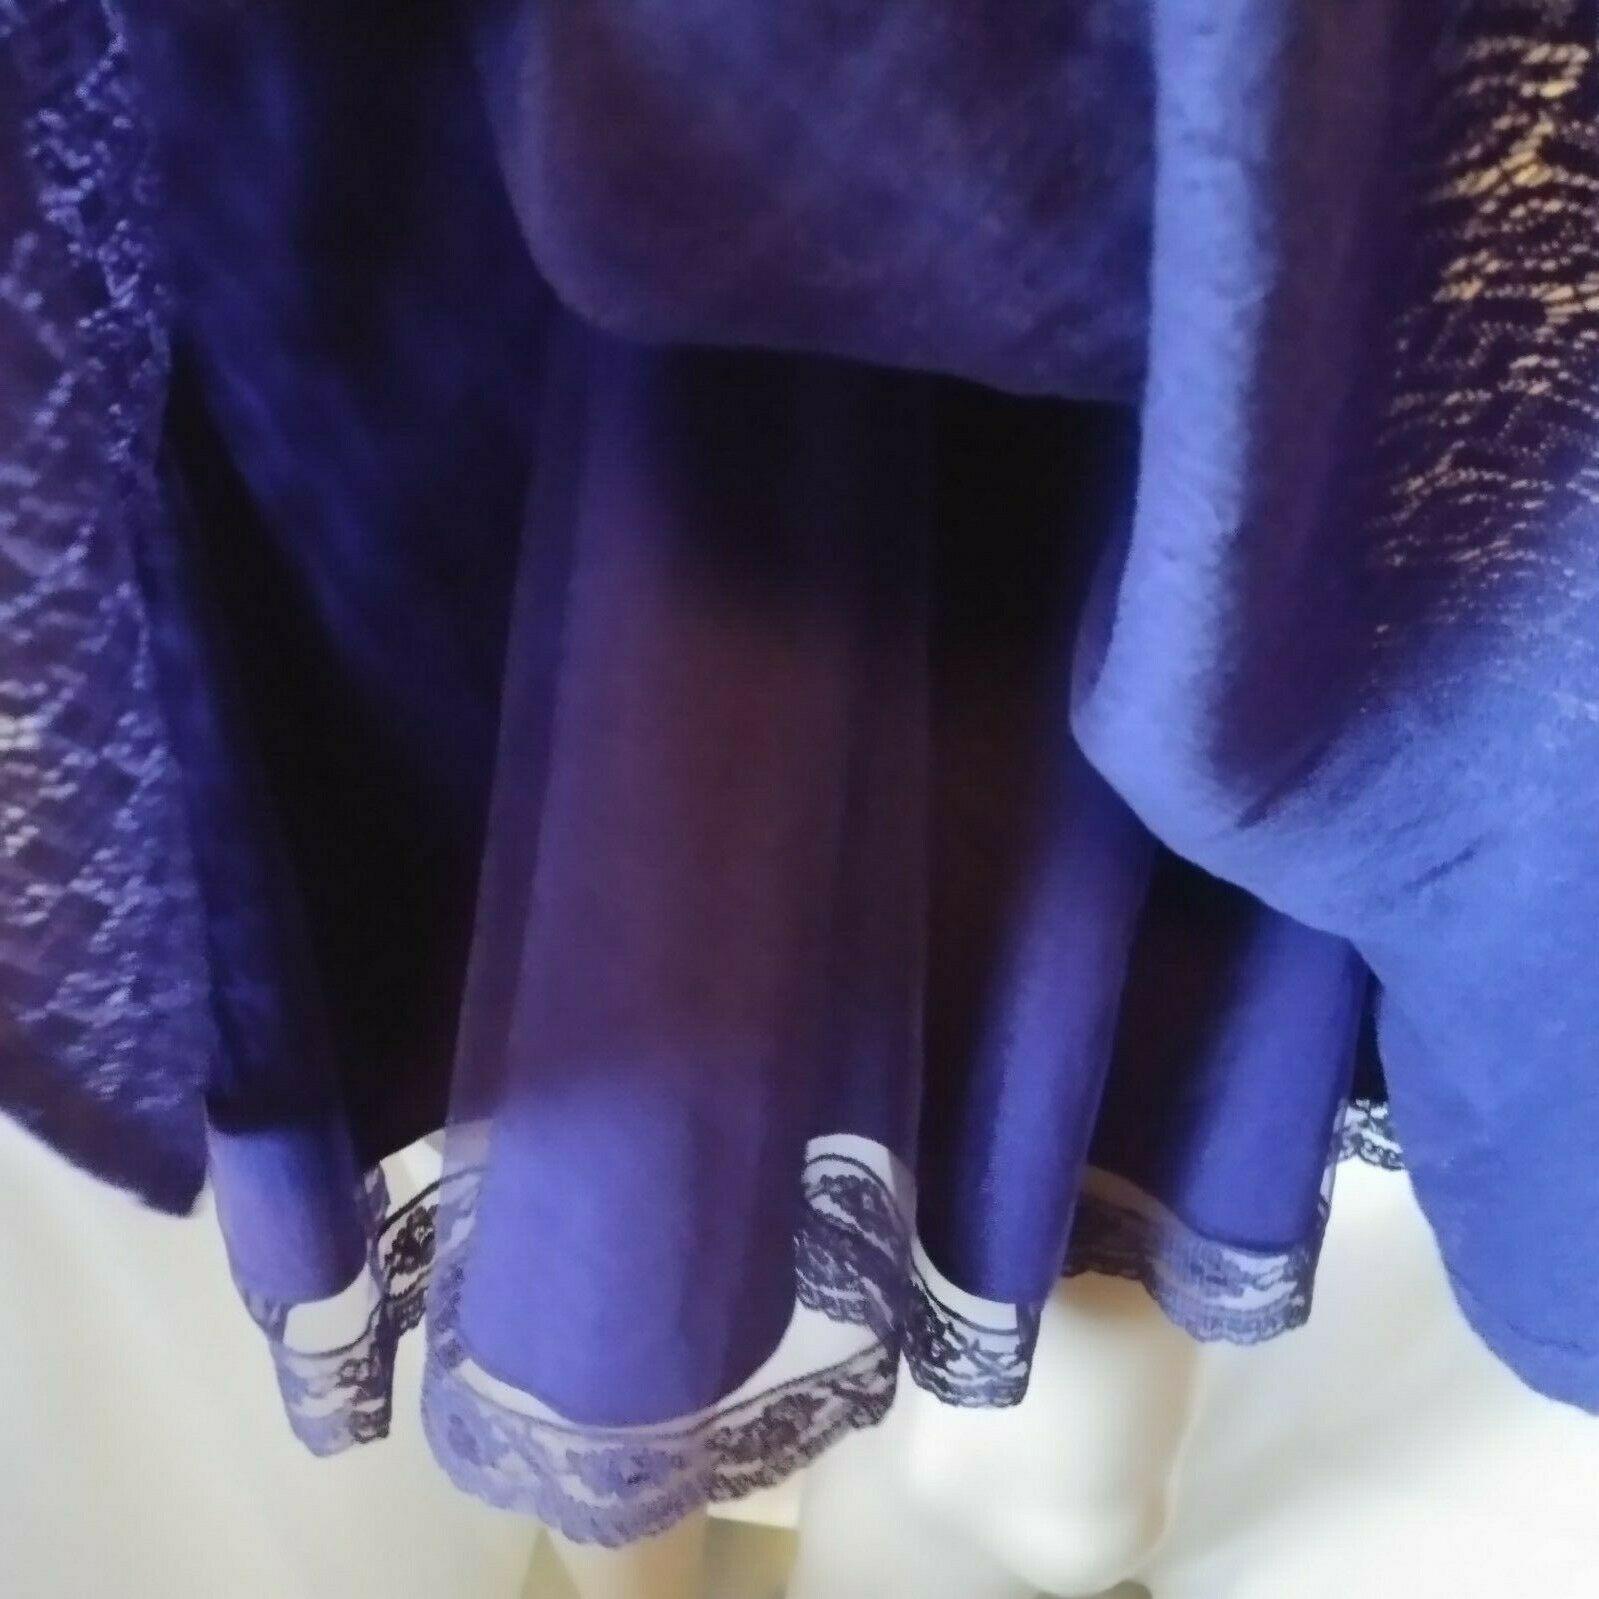 Free People Lace Dress Size 2 Purple Lined Boho Sleeveless Short Fit Flare